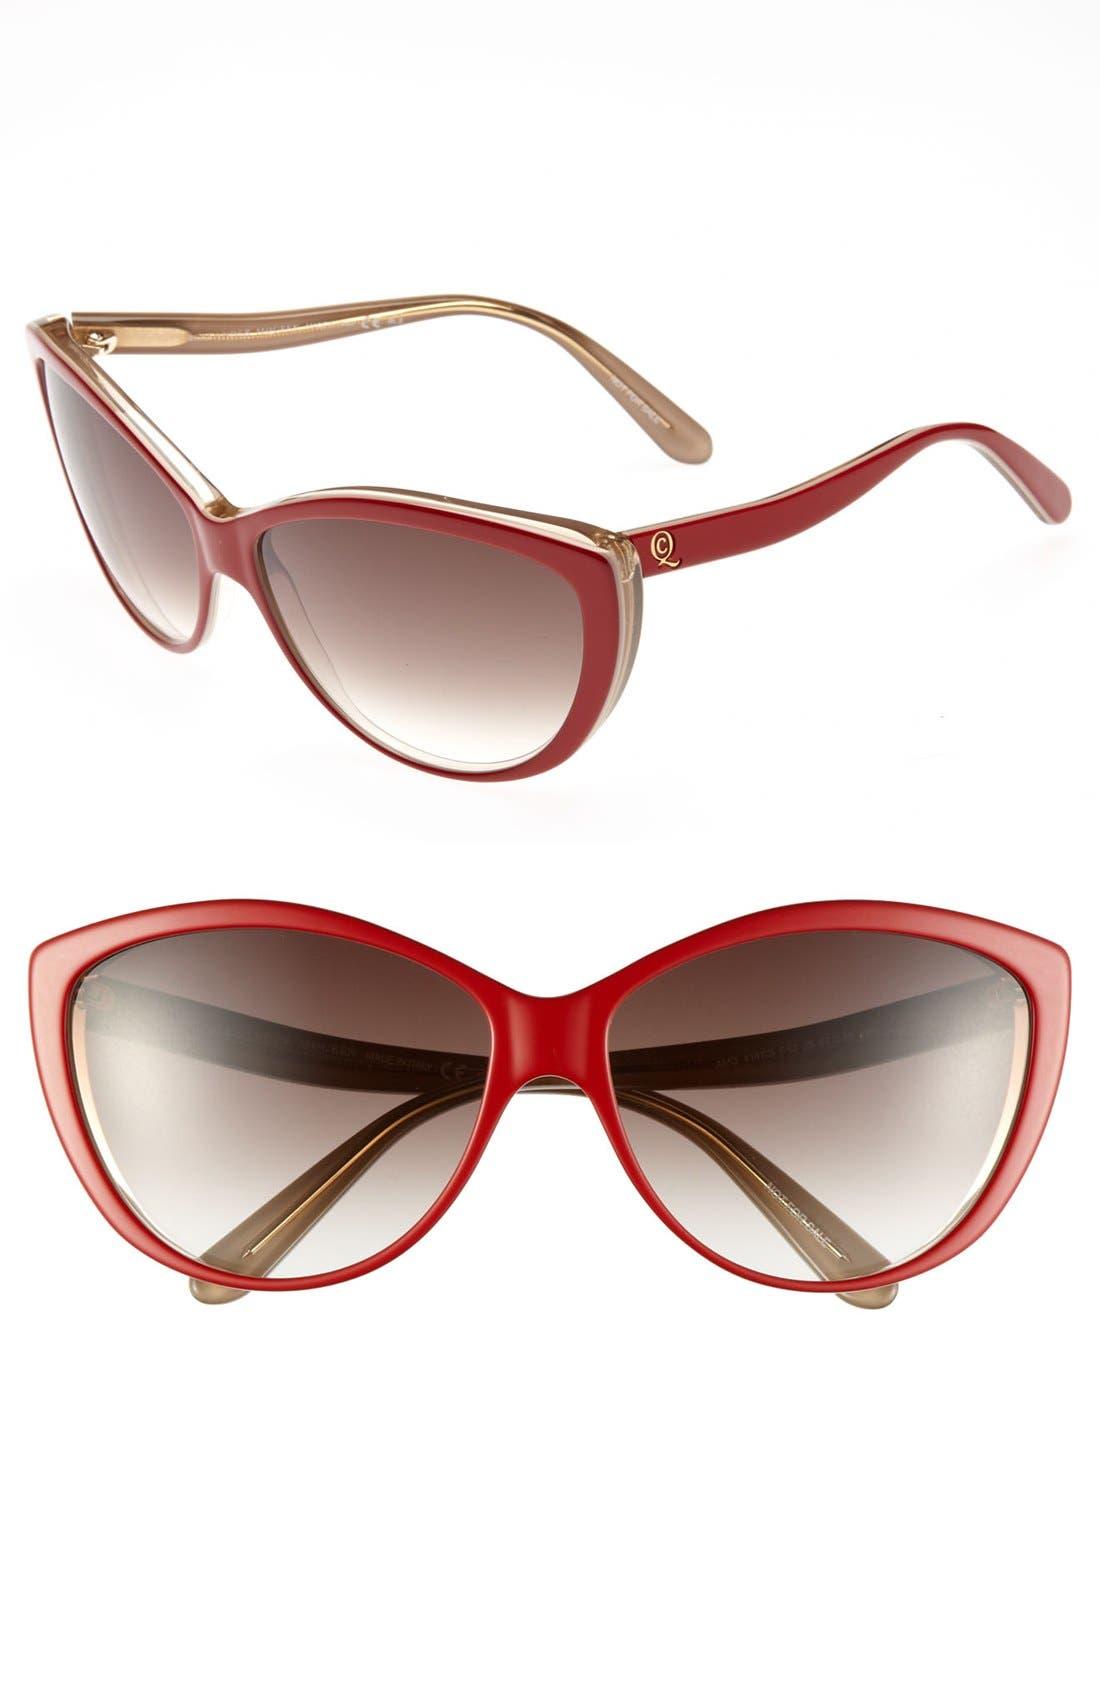 61mm Two-Tone Cat Eye Sunglasses,                             Main thumbnail 10, color,